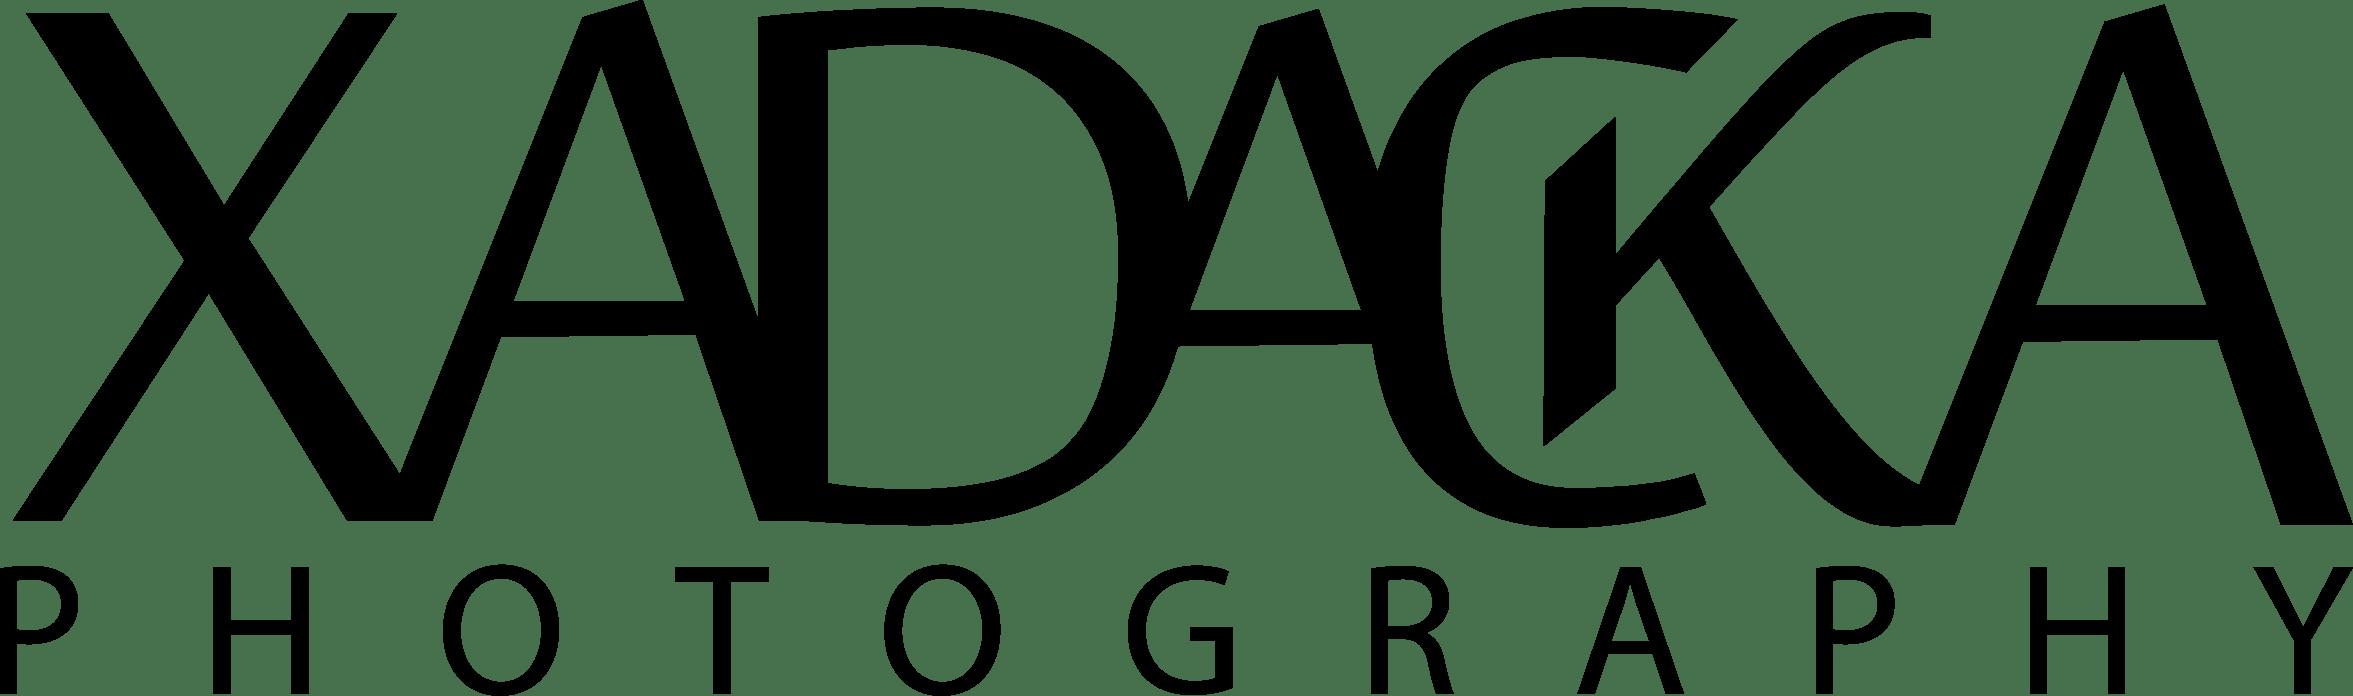 Xadacka.com Logo